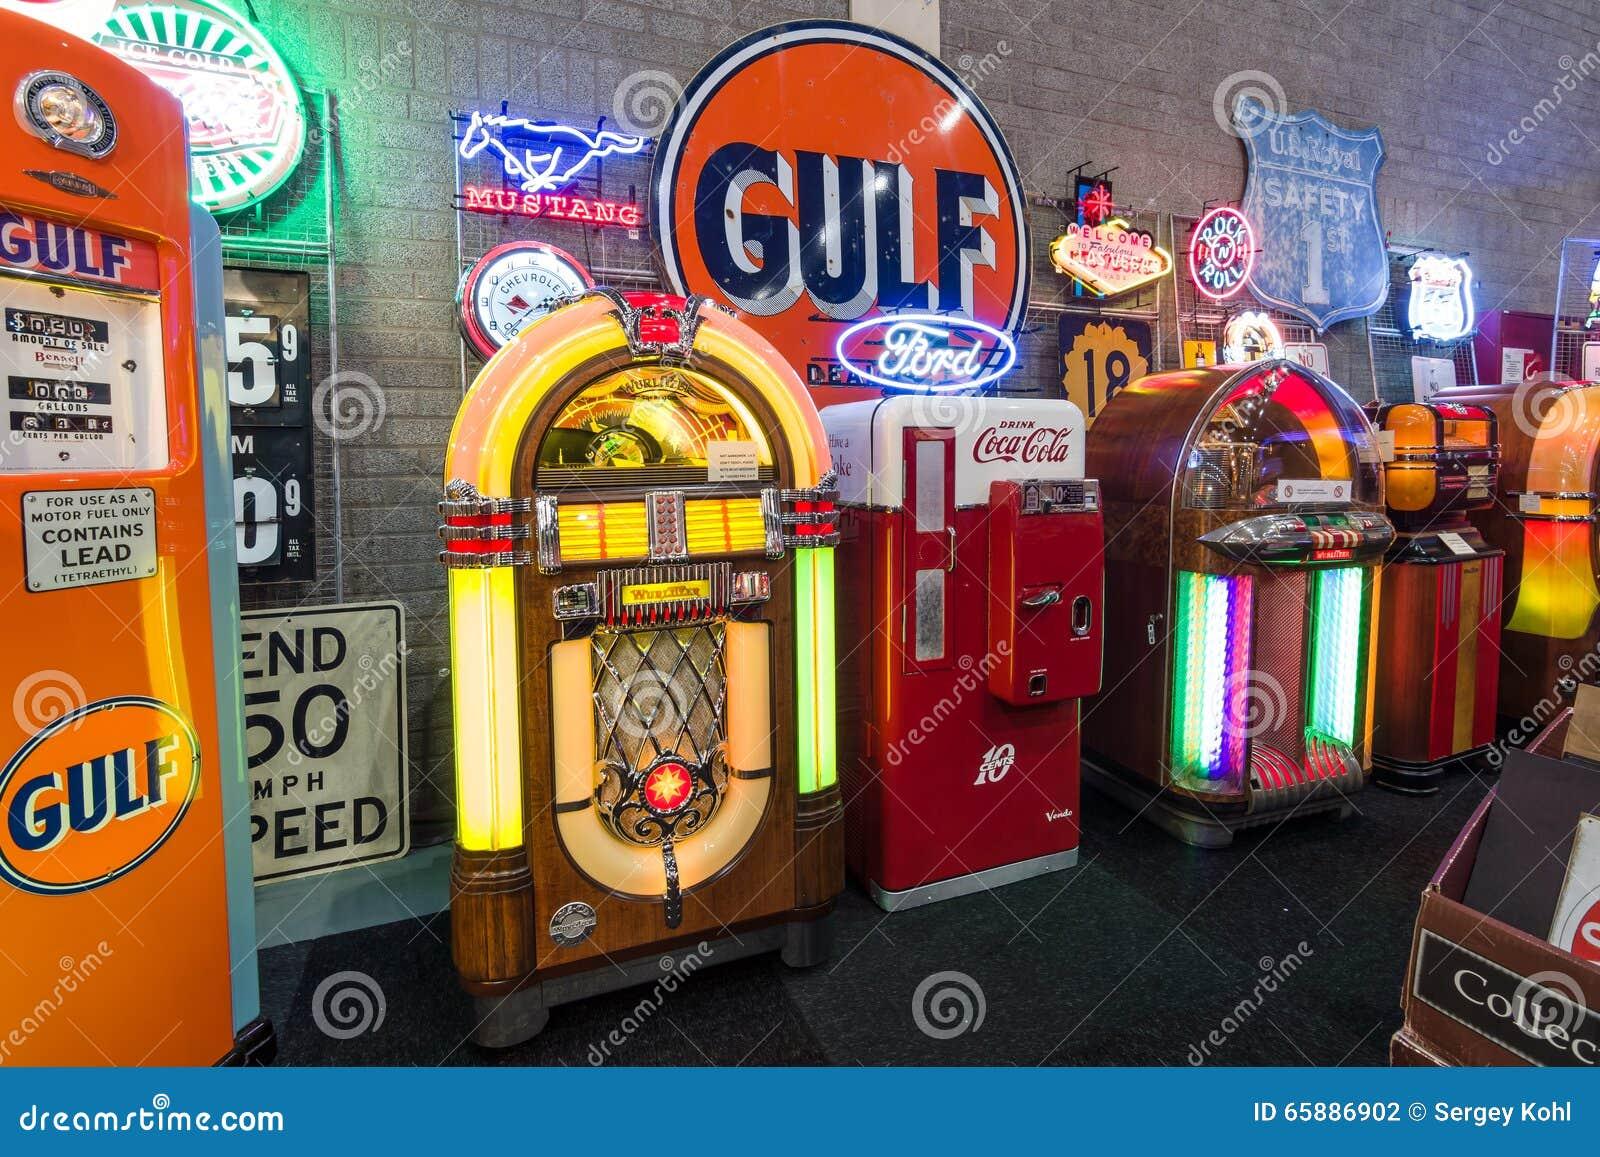 Retro Kühlschrank Coca Cola : Verschiedene retro musikautomaten und retro kühlschrank coca cola